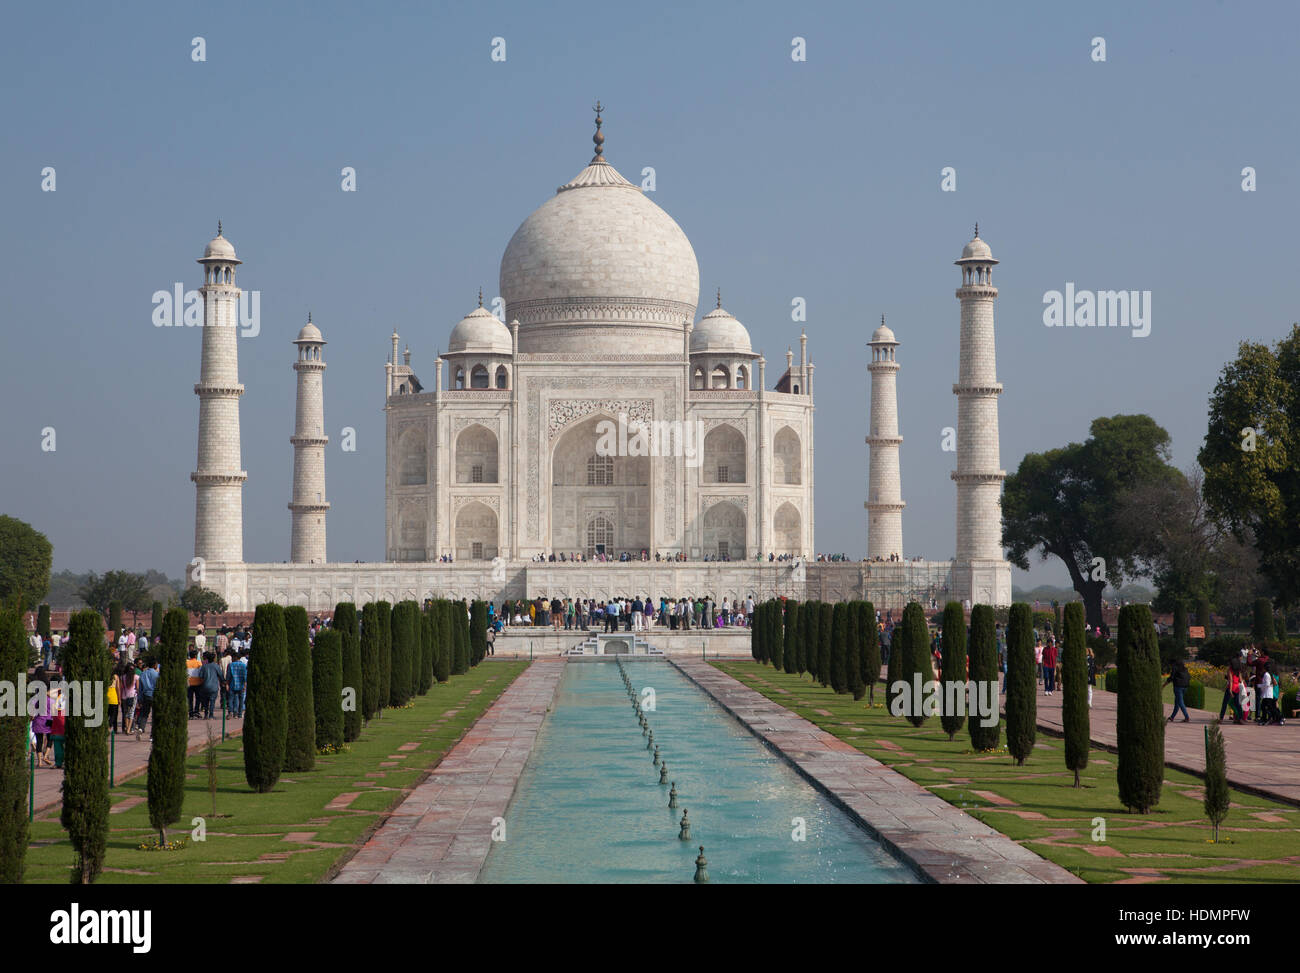 El mausoleo de Taj Mahal, sur de ver ,de Uttar Pradesh, India Foto de stock